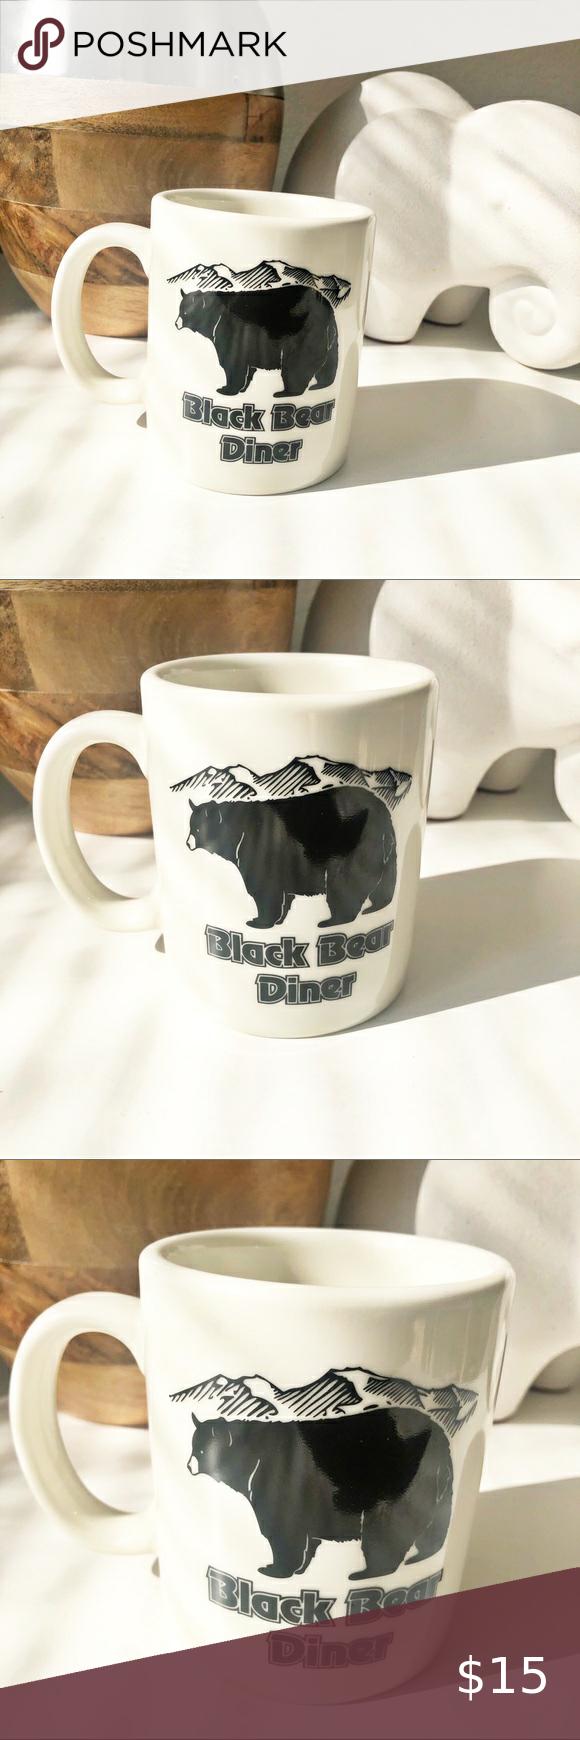 Black Bear Diner Mug Mugs Black Bear Diner